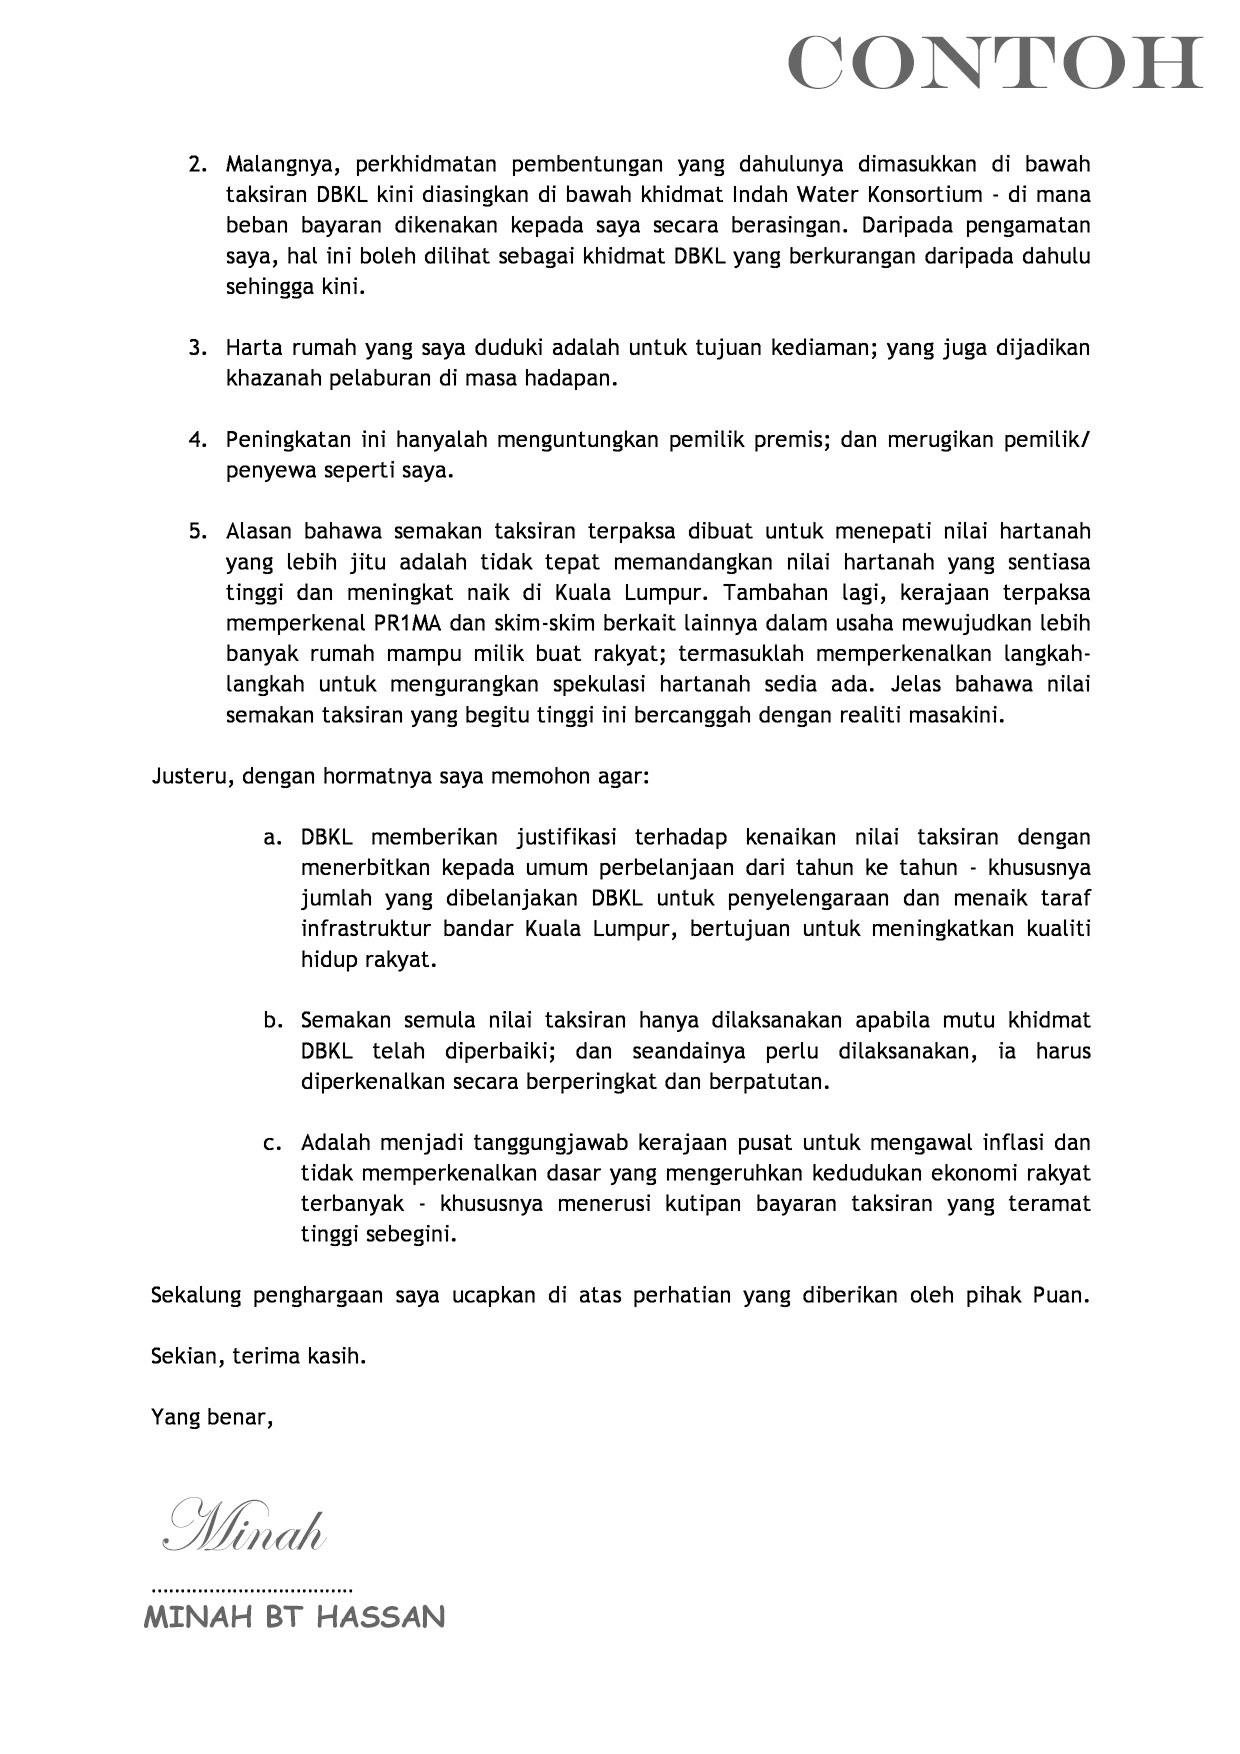 surat rasmi gst frasmi